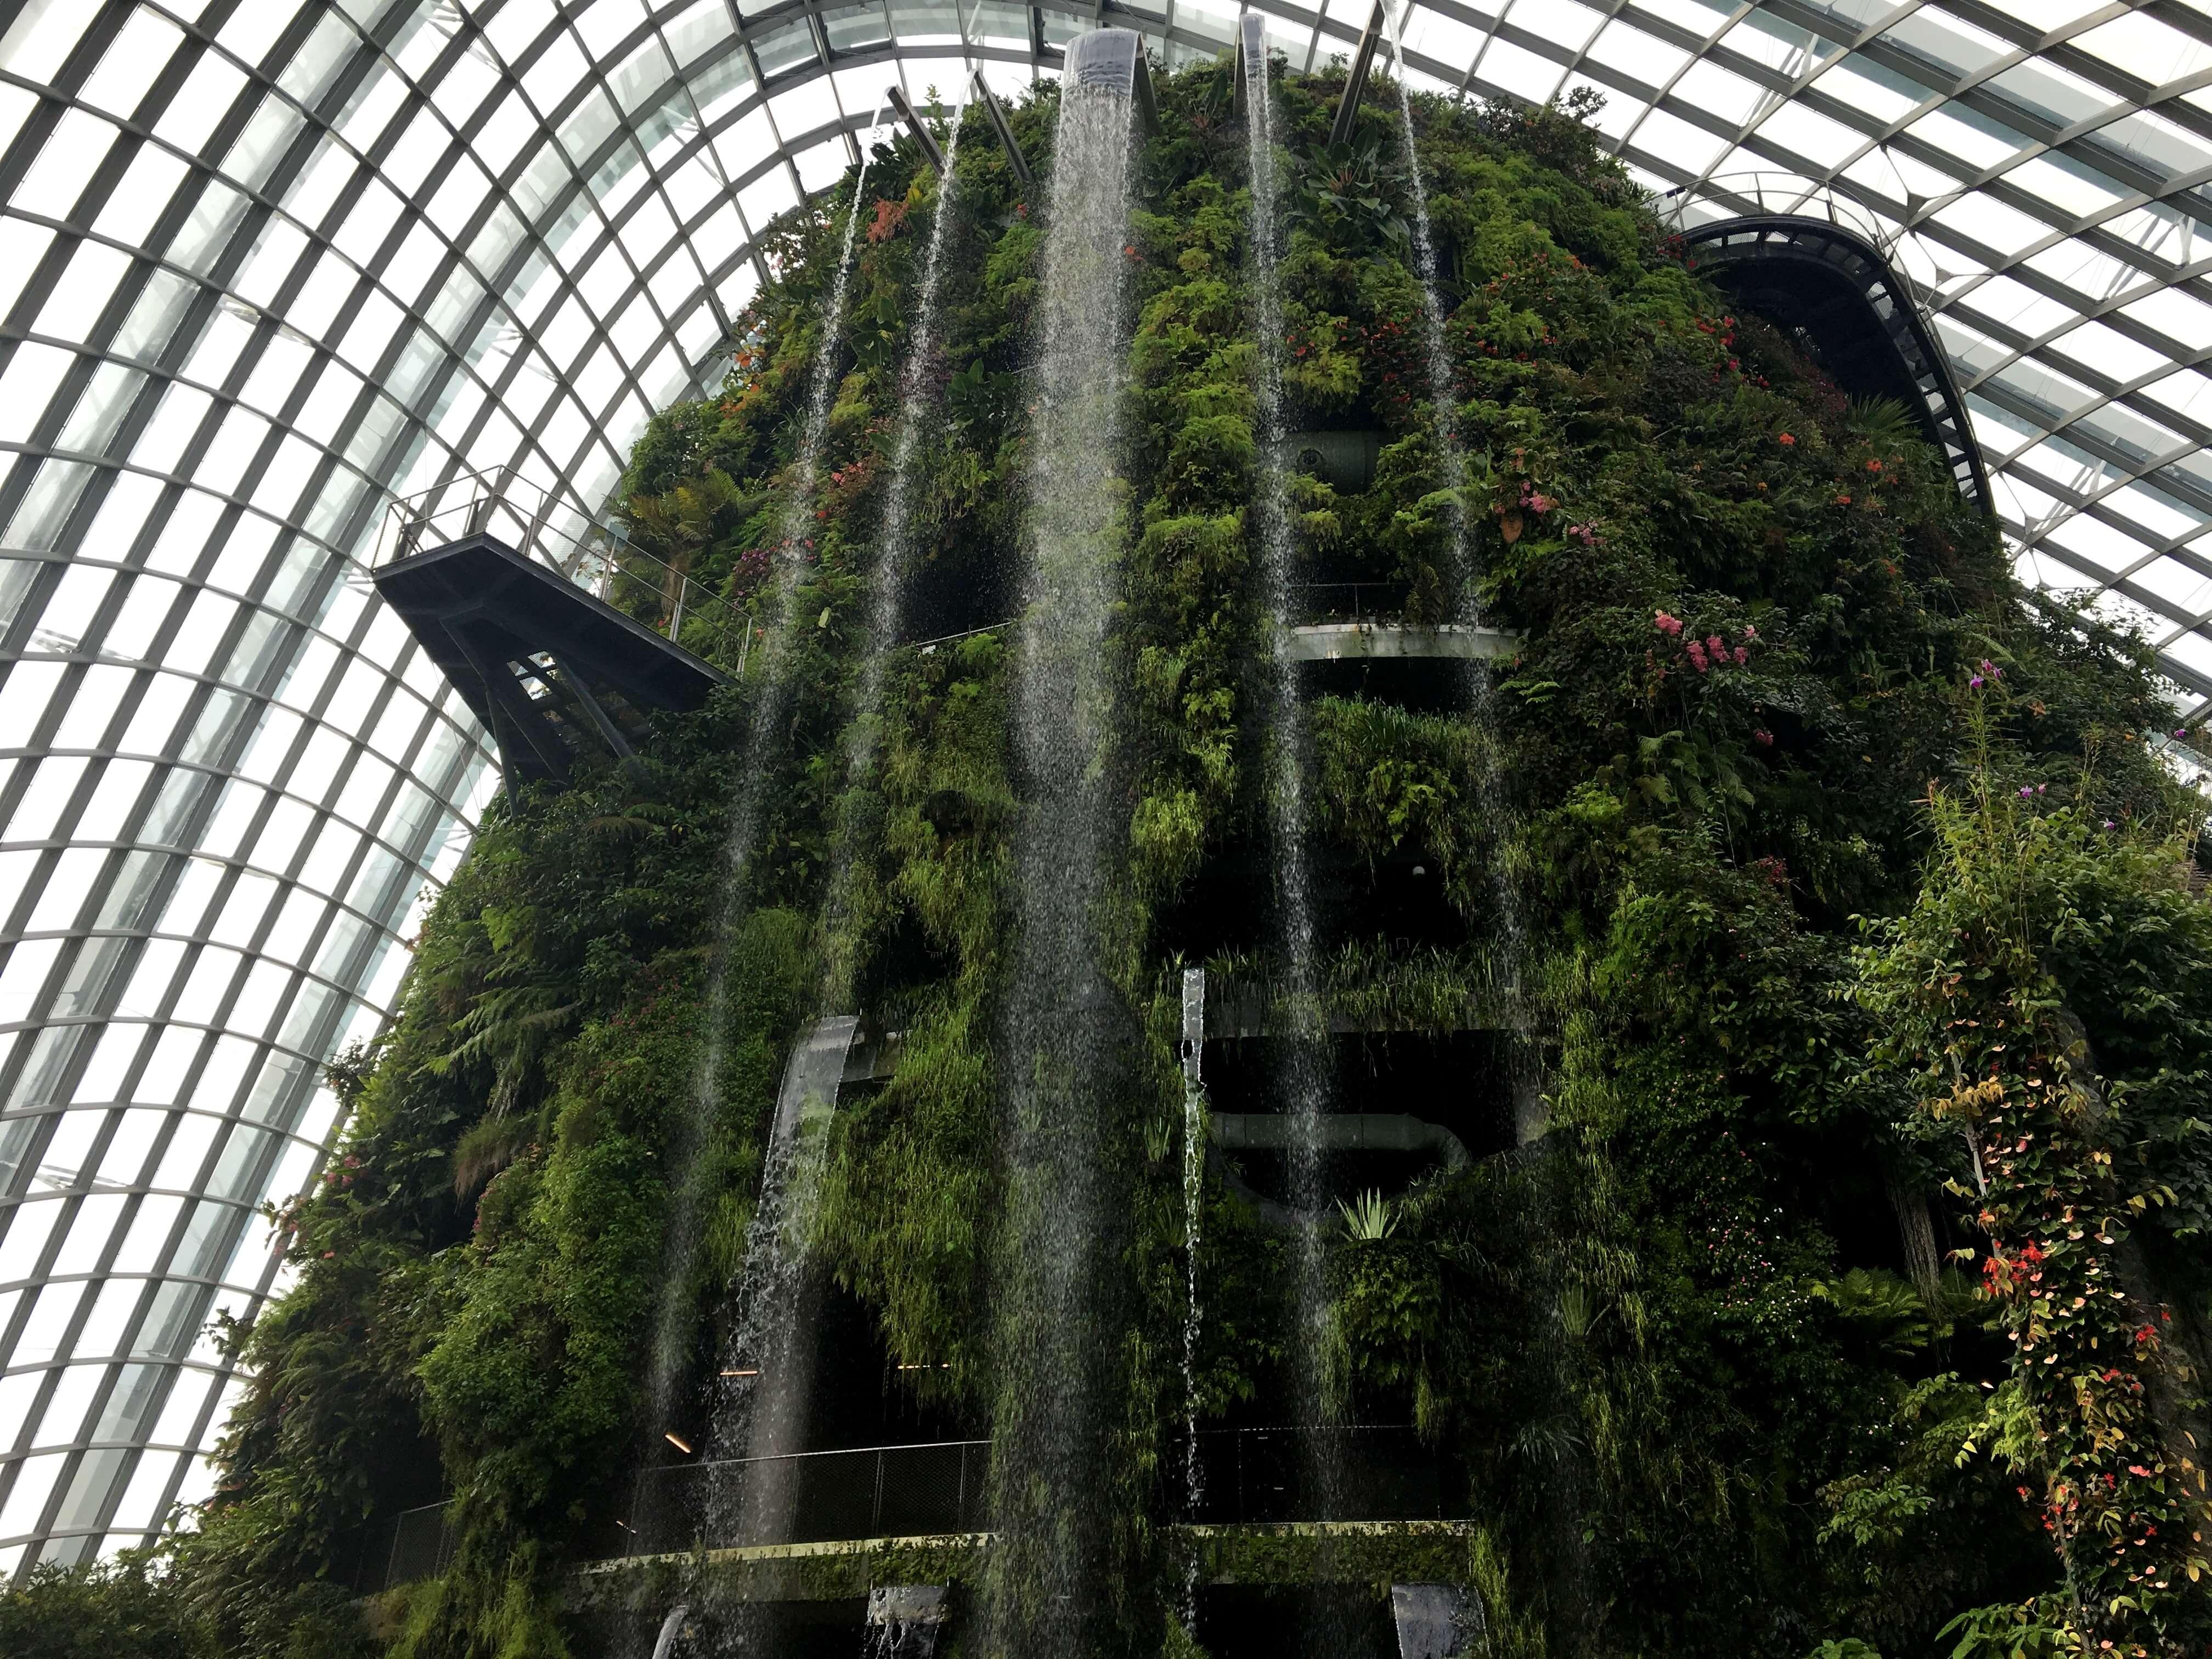 singapur-reisetagebuch-gardens-by-the-bay-cloud-forest-makeupinflight-1